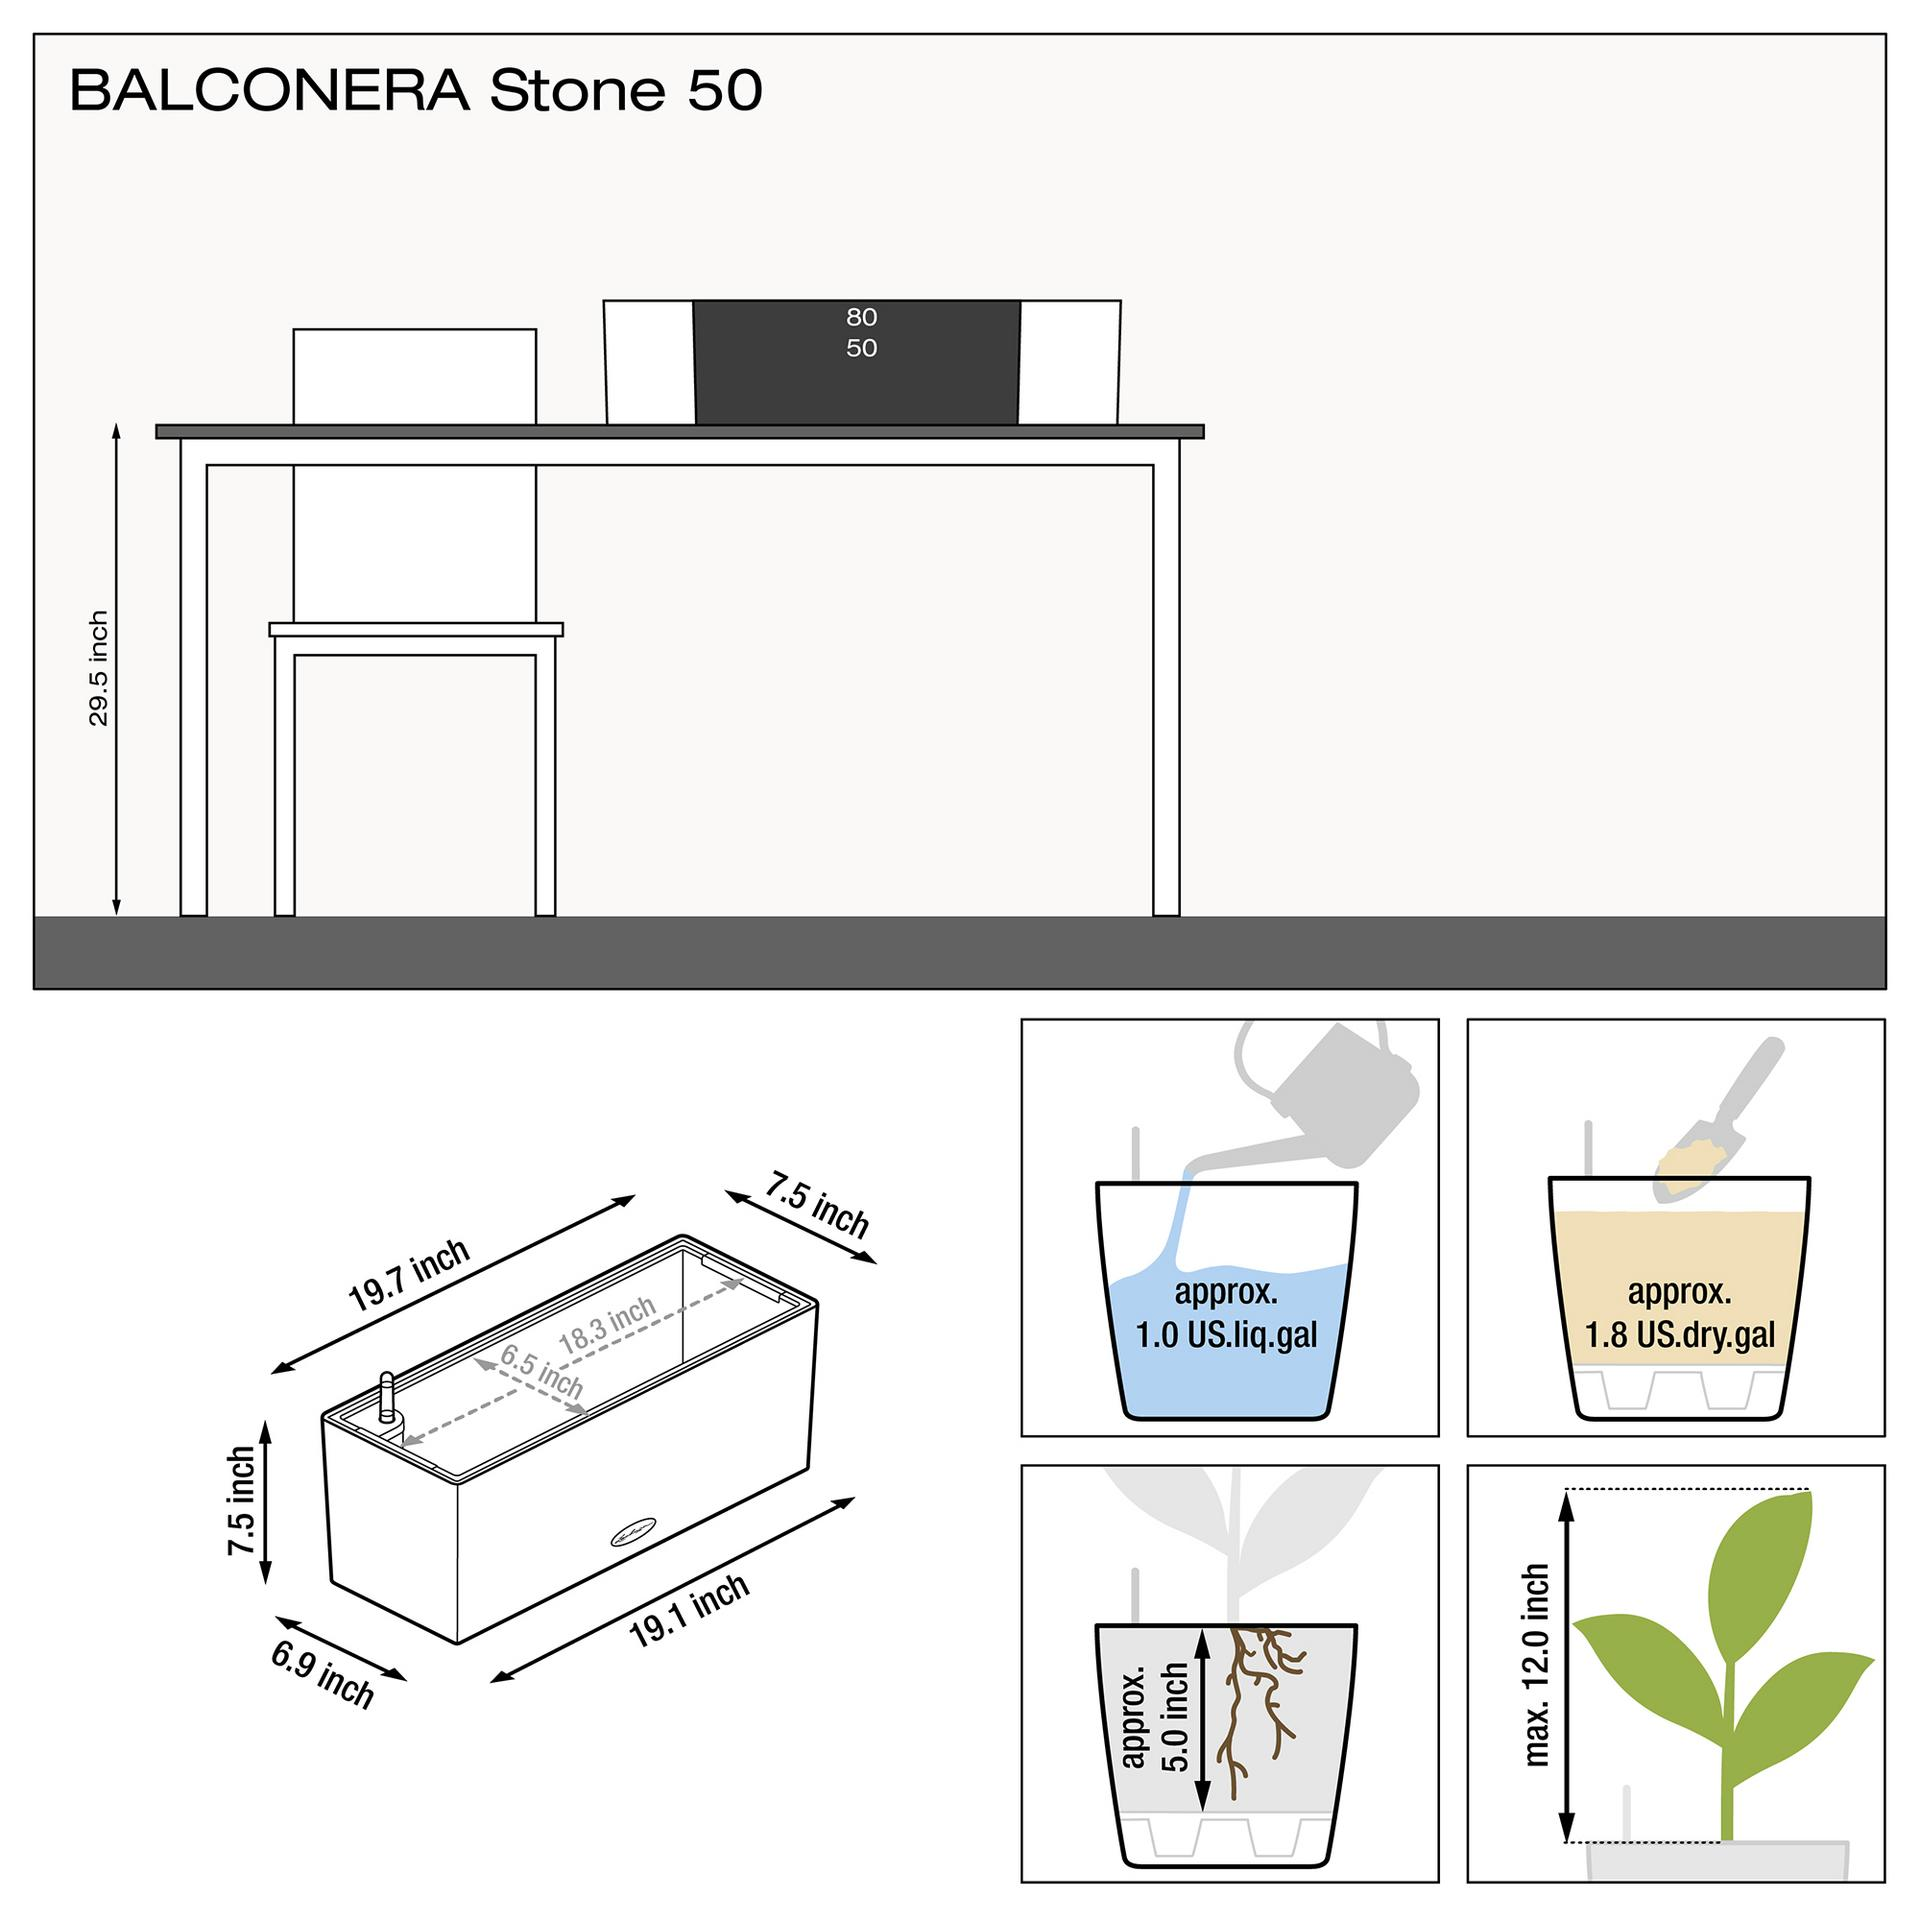 le_balconera-stone50_product_addi_nz_us